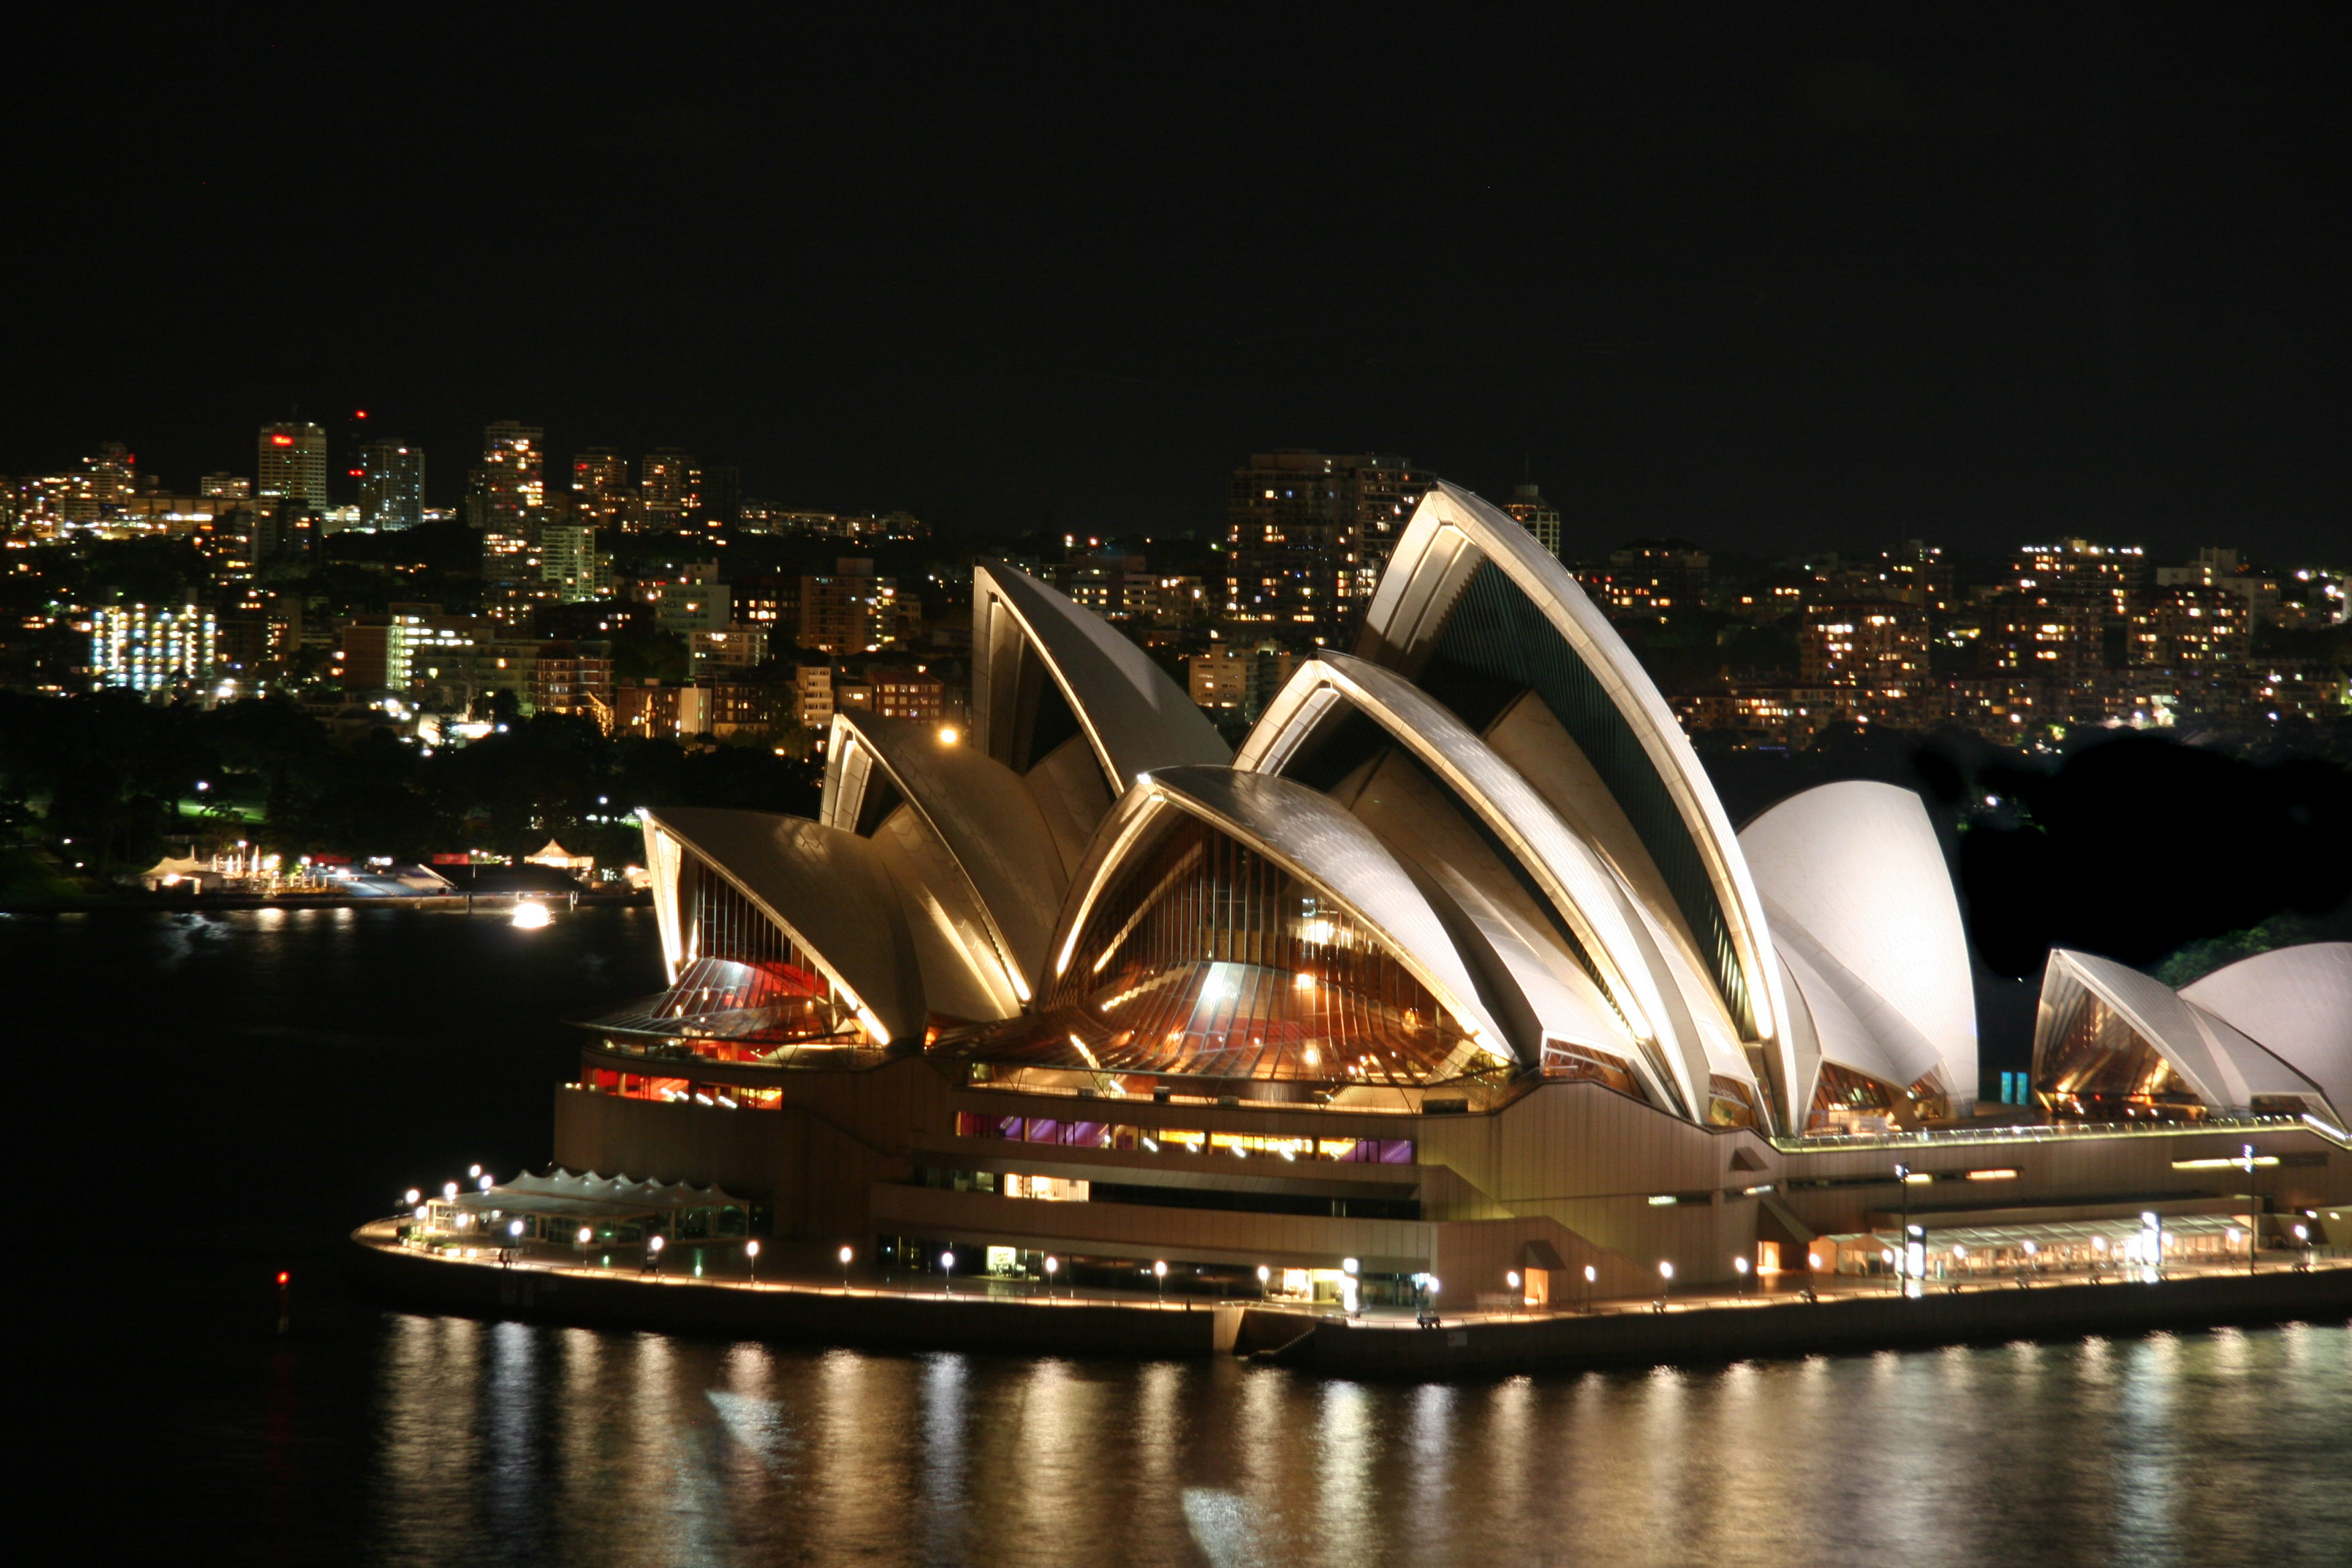 Sydney Opera House Historical Wallpaper   Travel HD Wallpapers 3504x2336